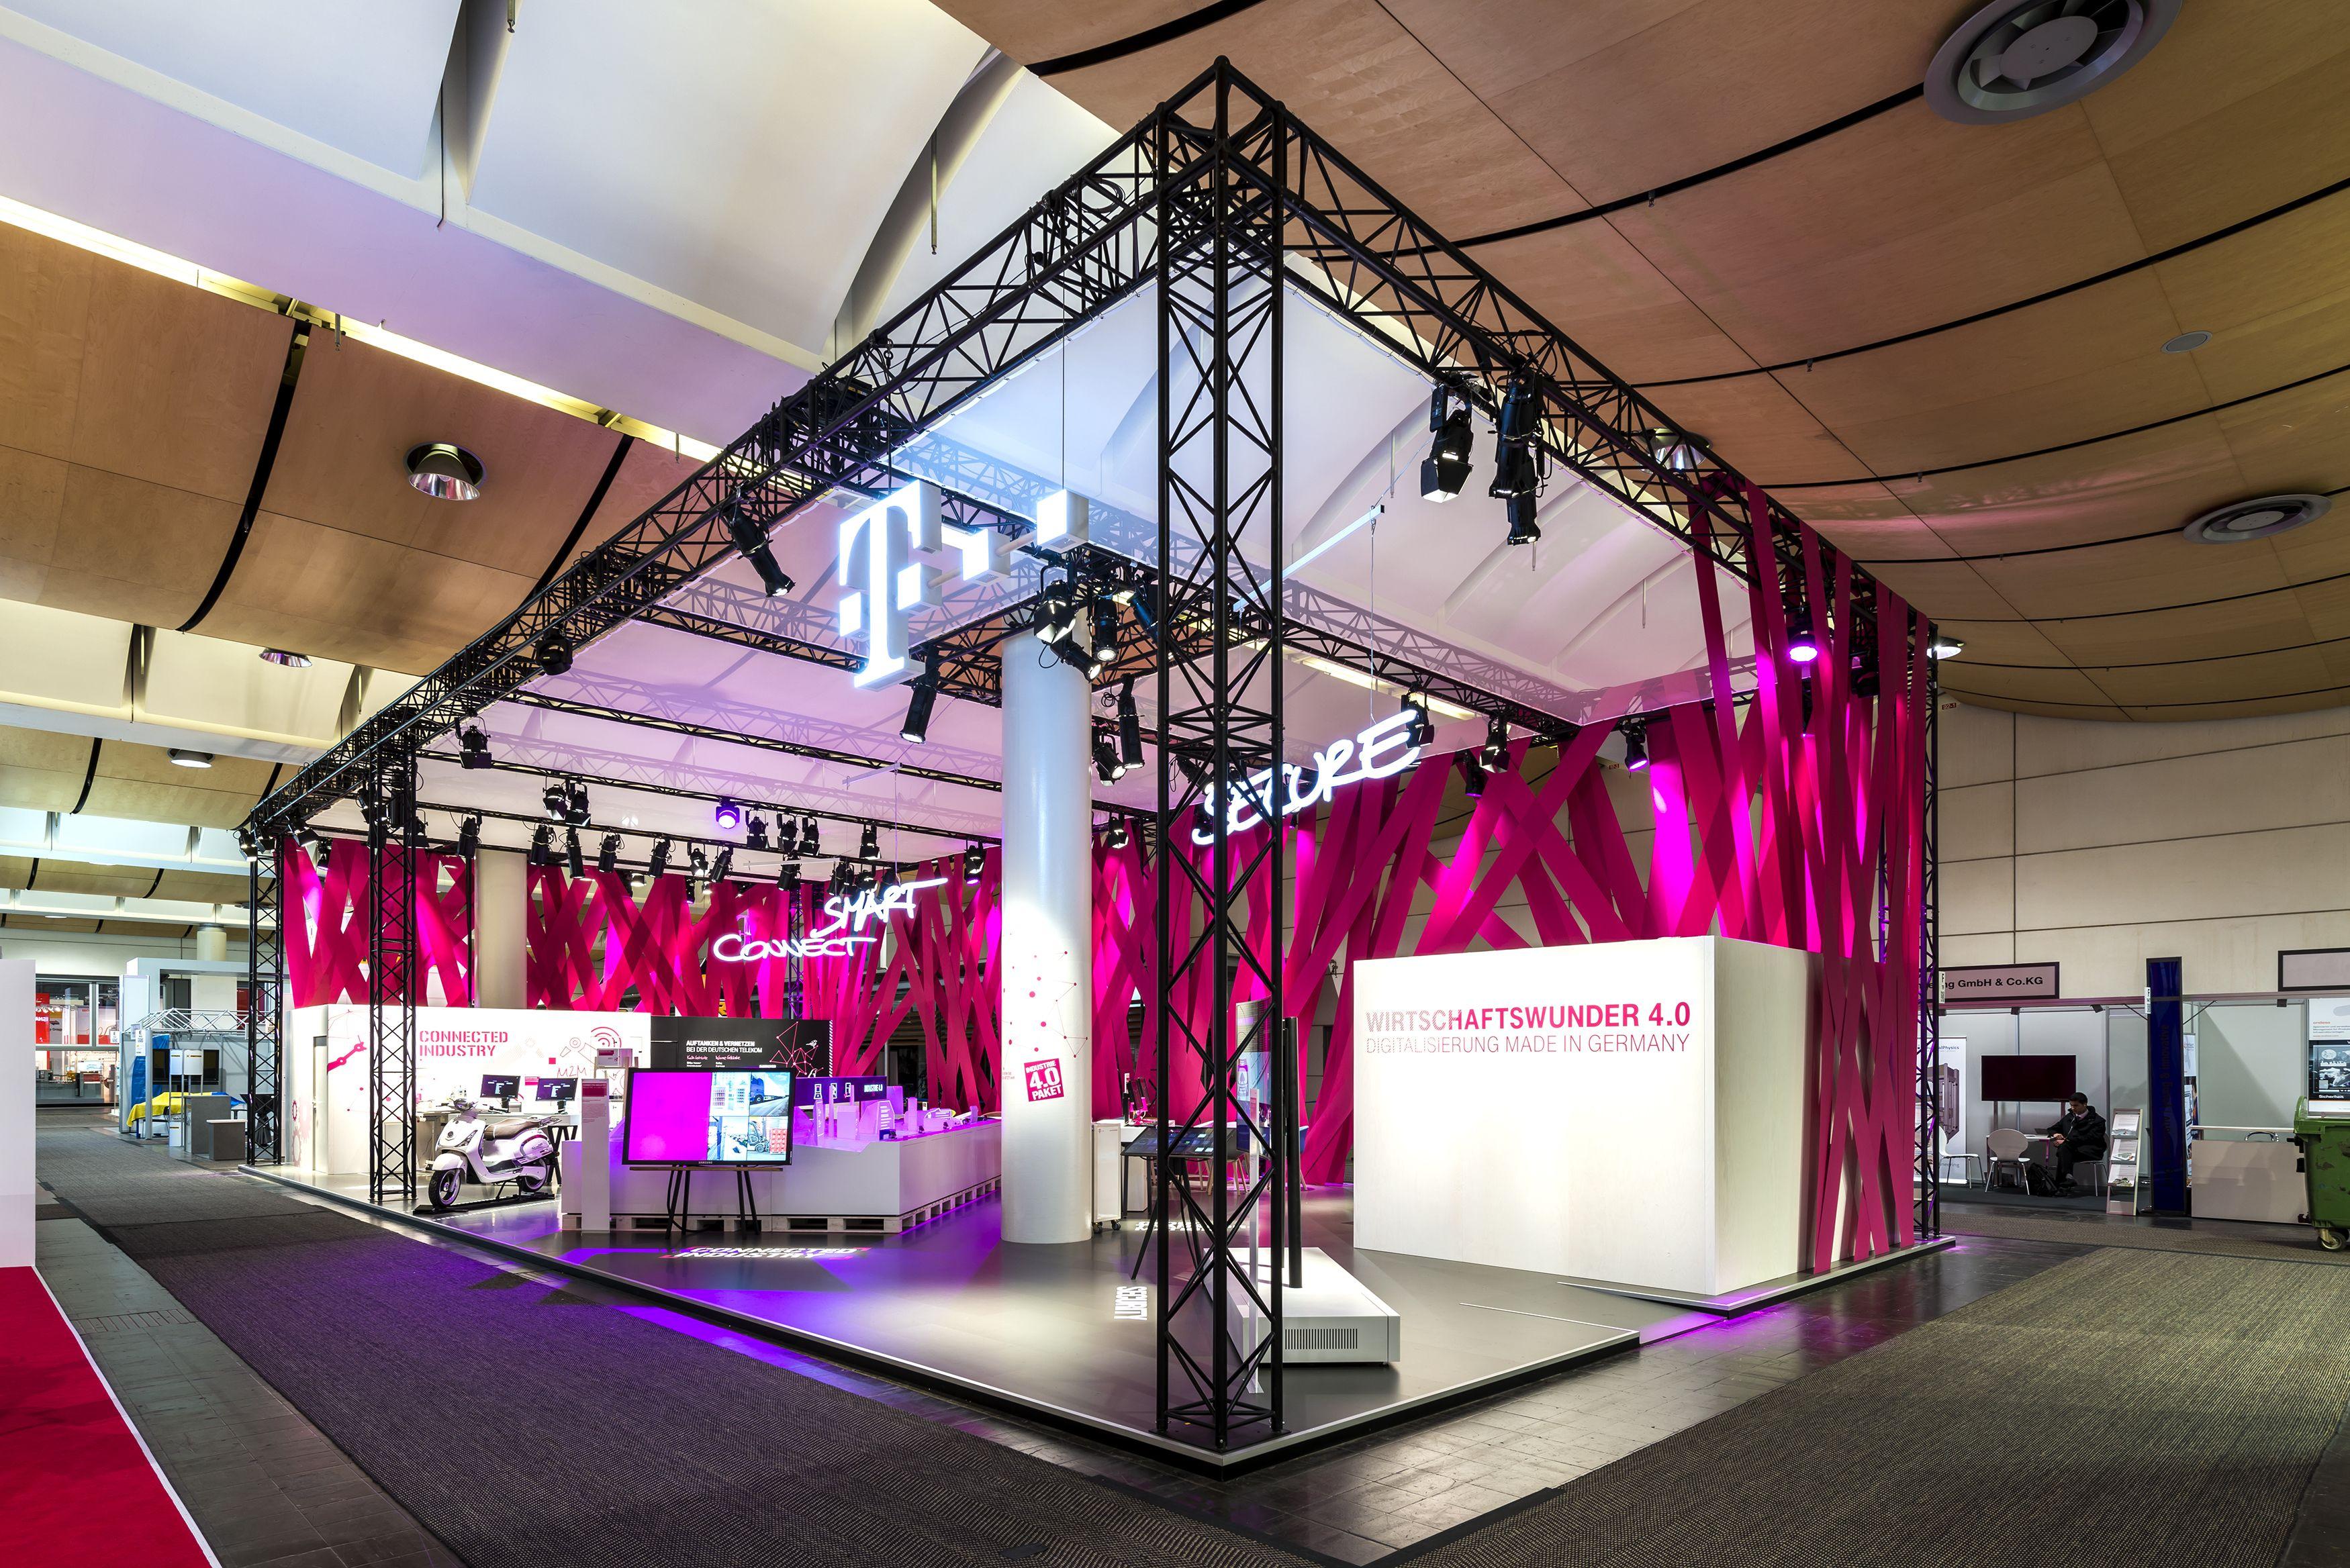 Deutsche Telekom Stand Hannover Messe 2015 Brand Experince 3d Communication Trade Fair Retail Design Blog Exhibition Booth Design Retail Design Display